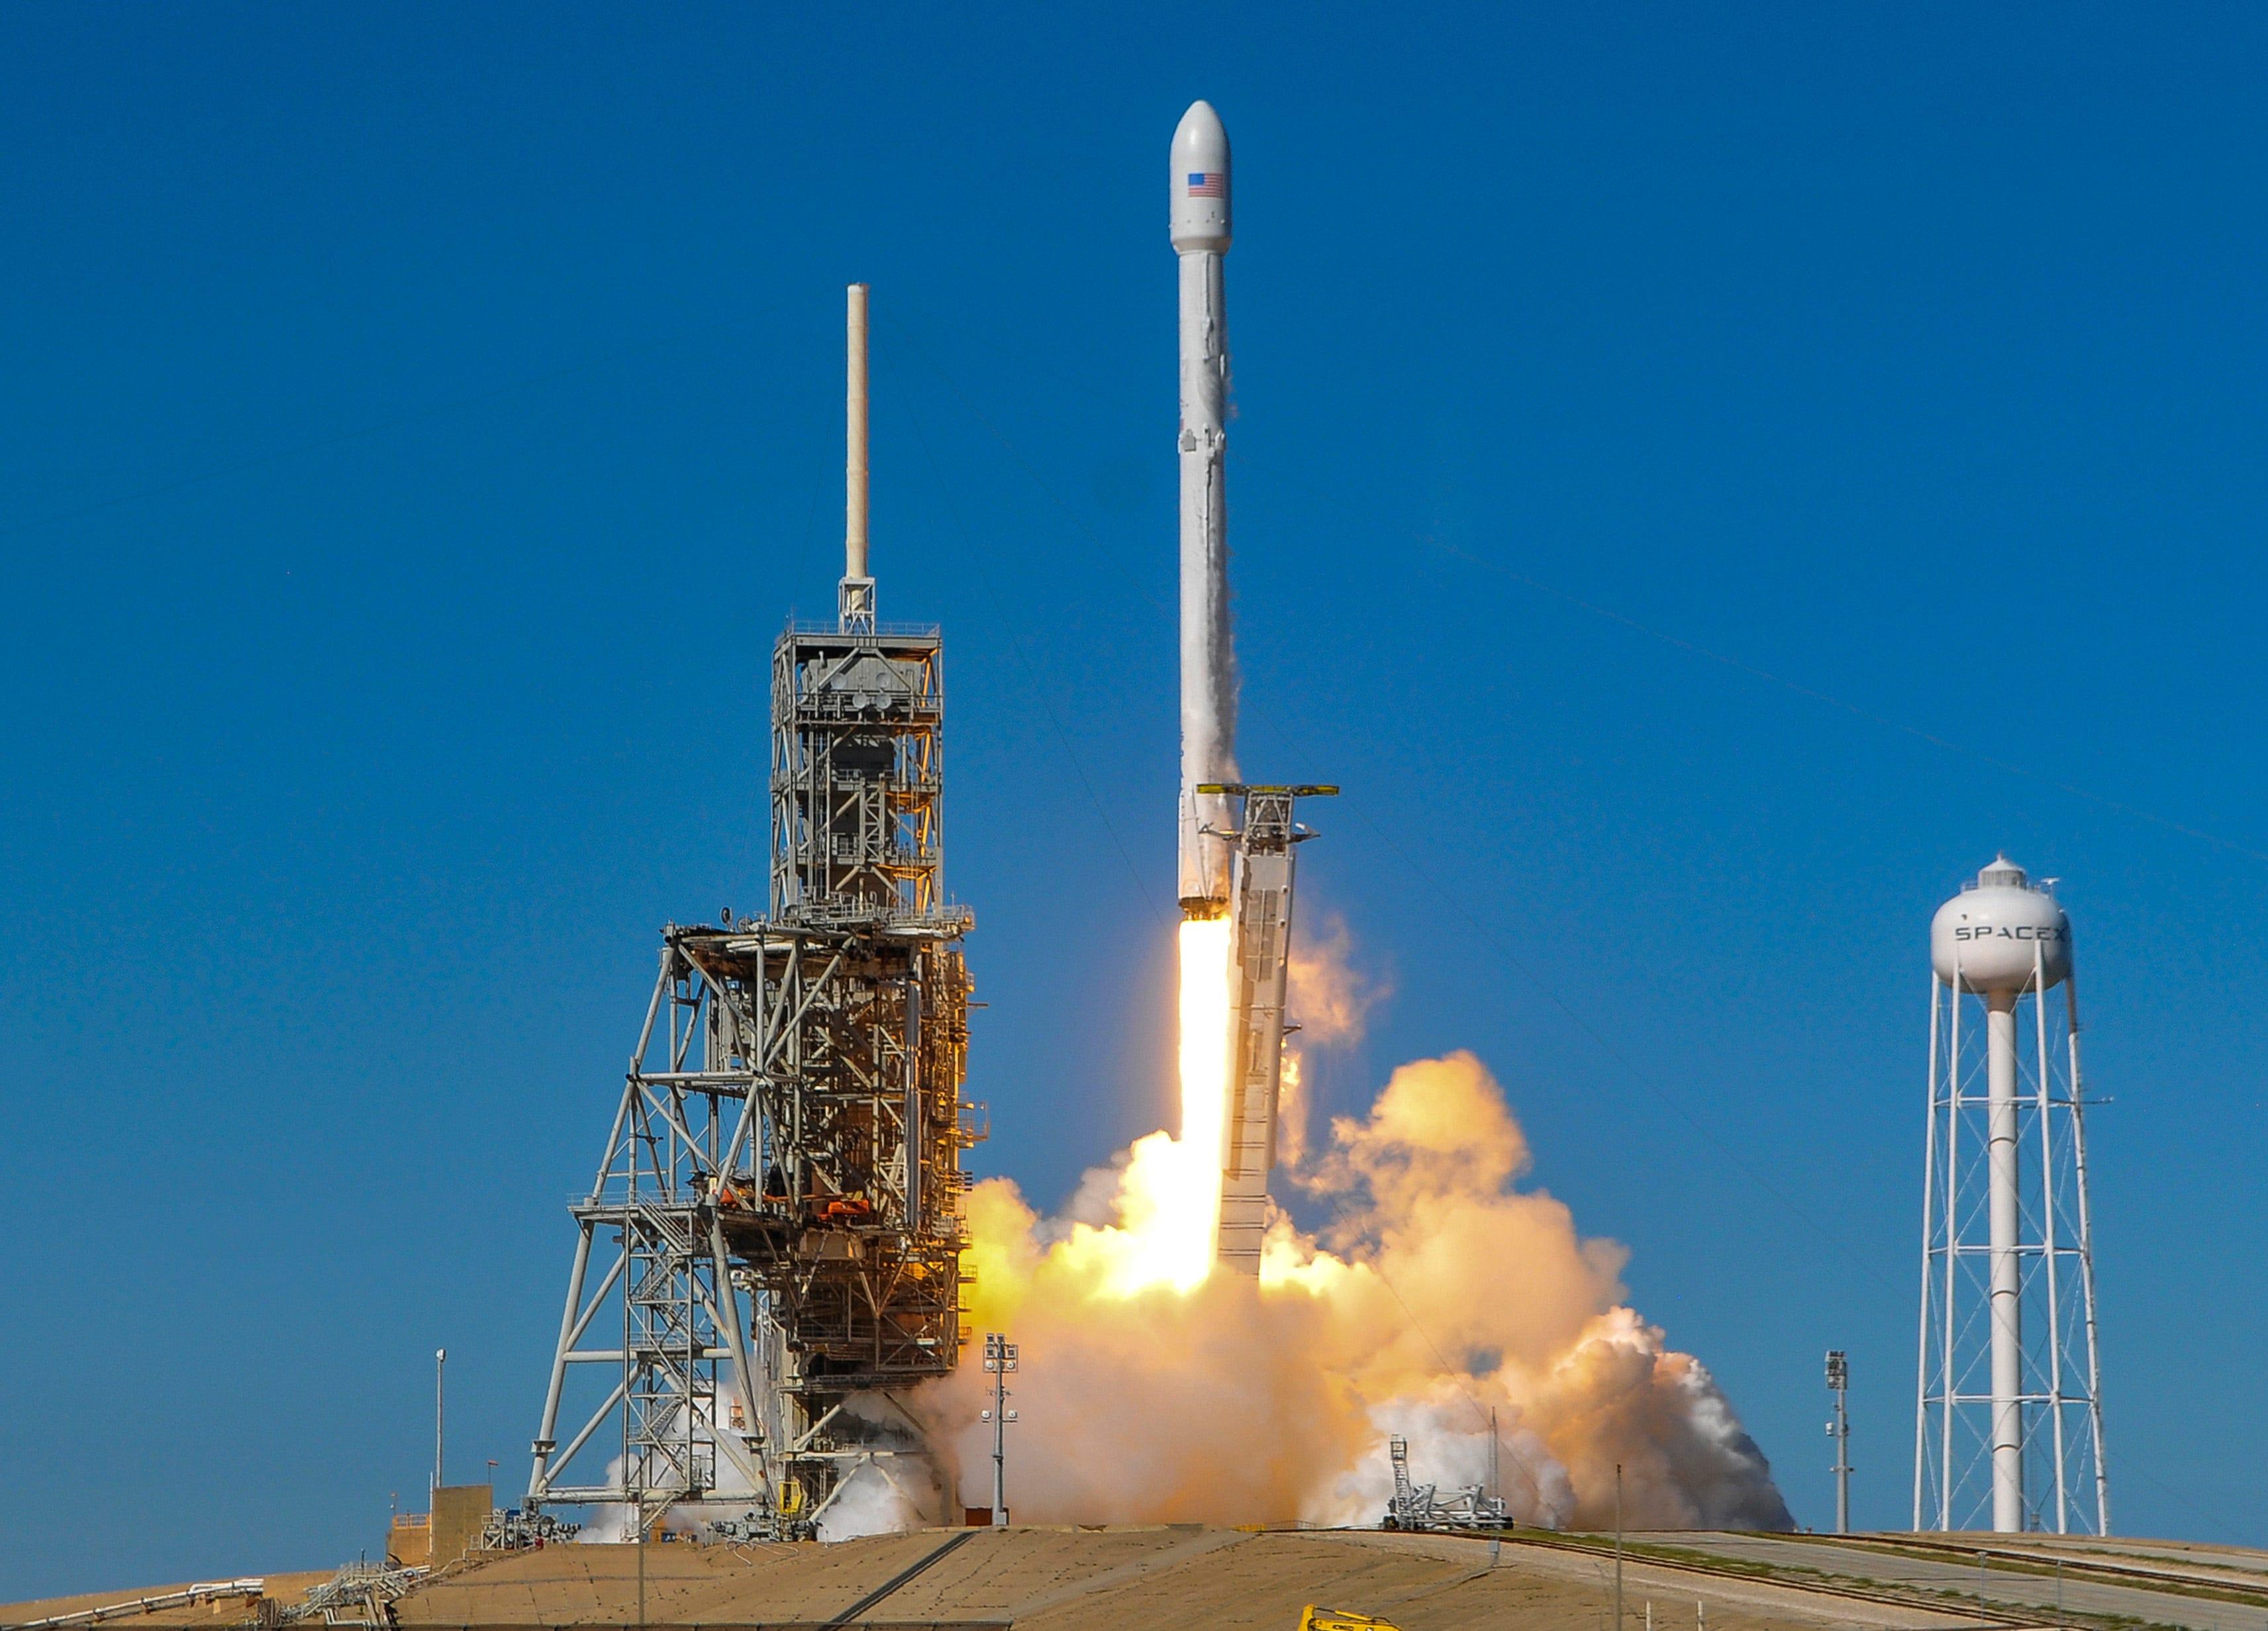 spacex hawthorne rocket - HD3425×2463